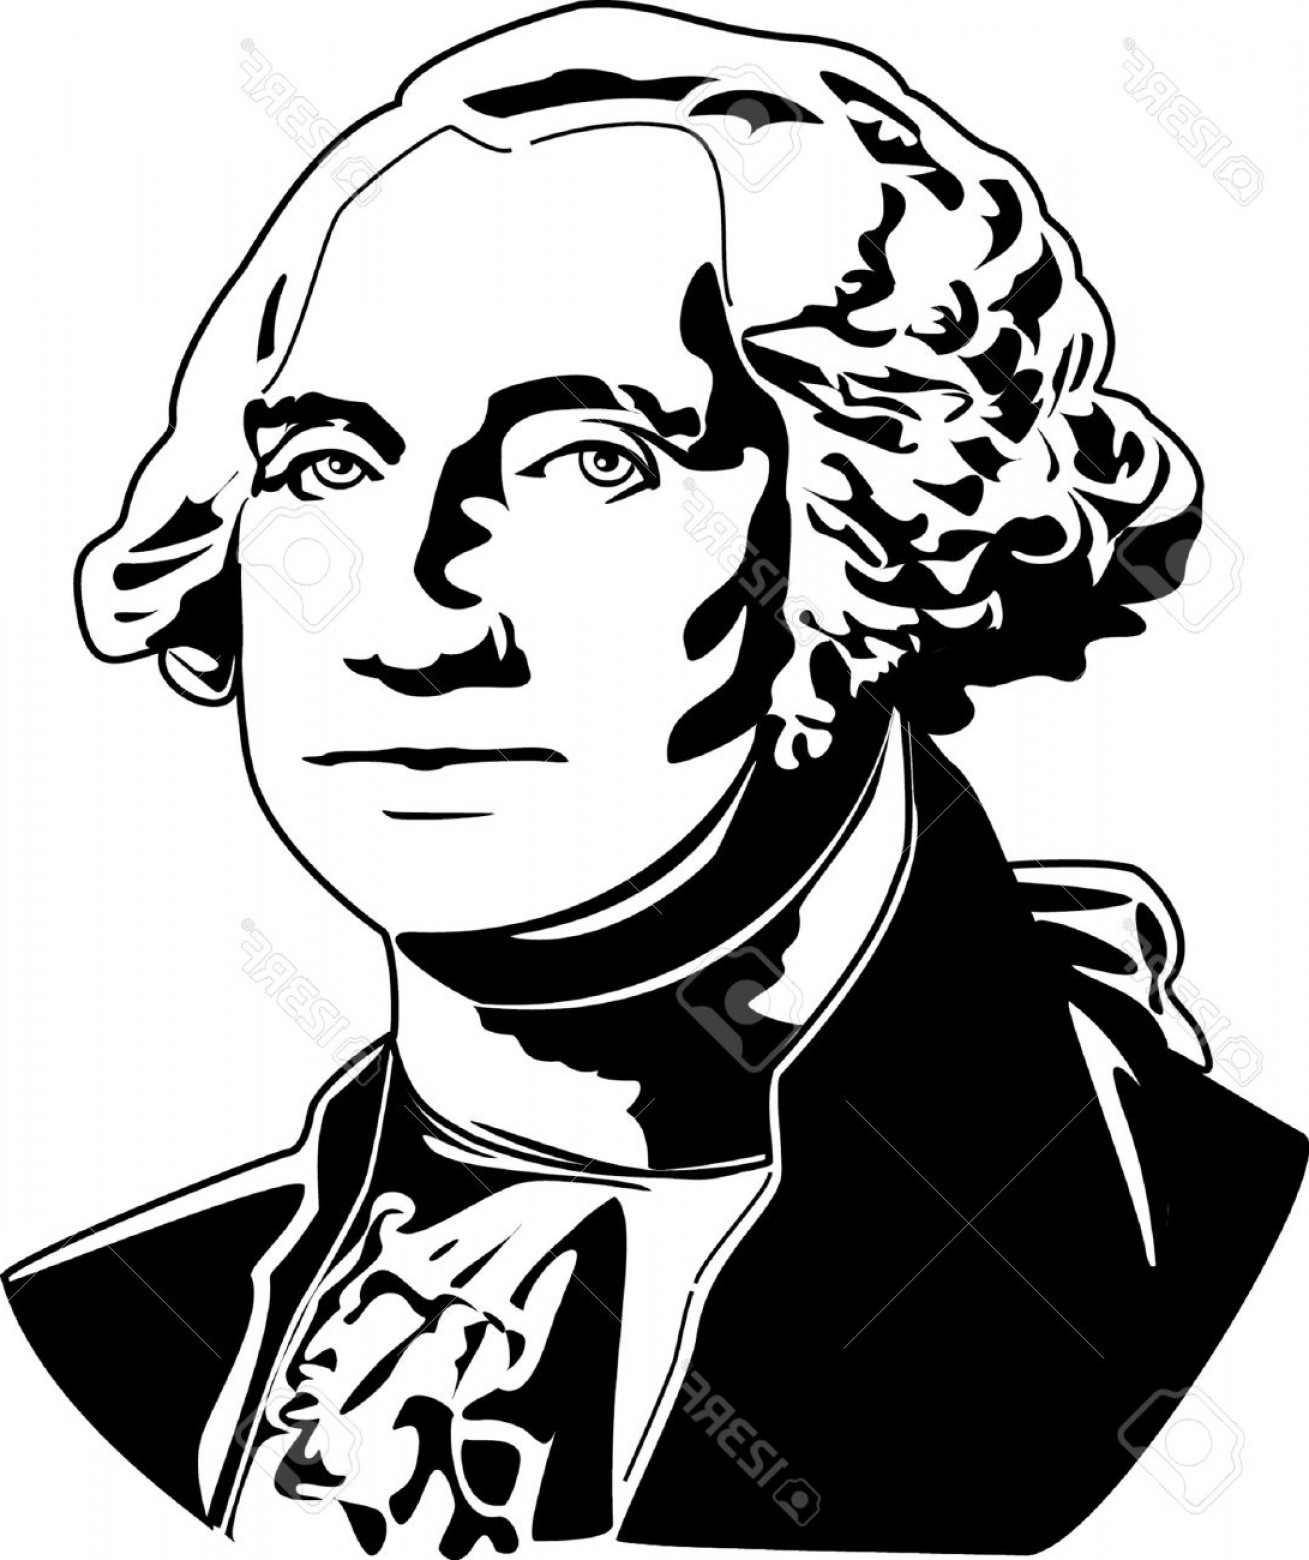 1309x1560 George Washington Clipart Black And White Arenawp